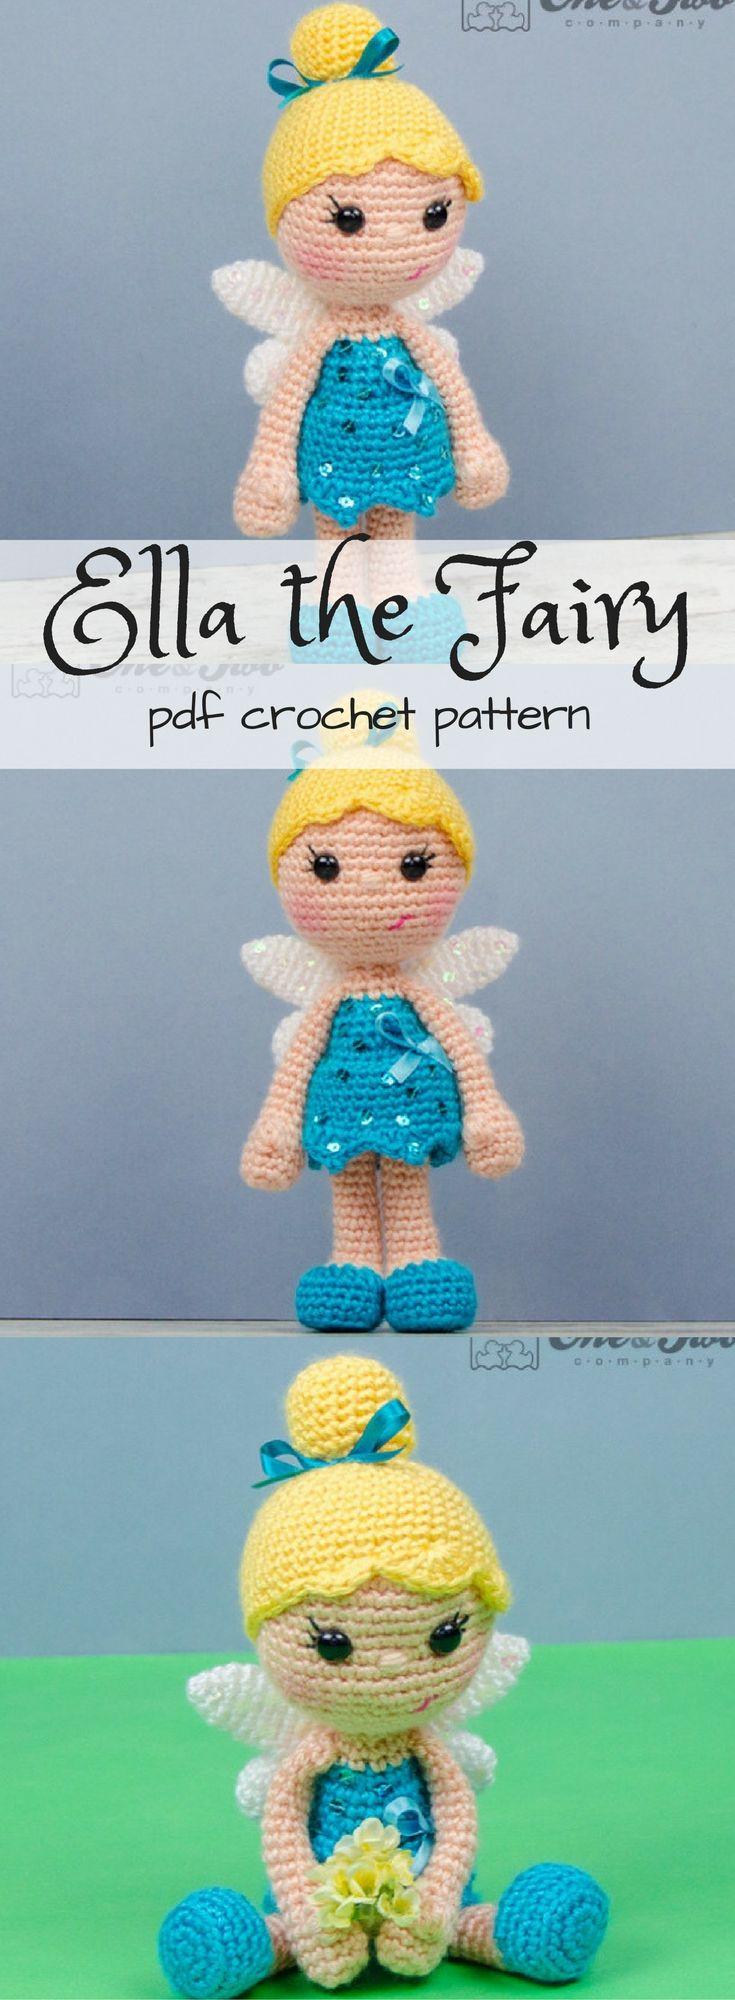 Crochet fairy doll pattern. PDF Amigurumi toy crochet pattern. Looks like Tinkerbell! #etdy #ad